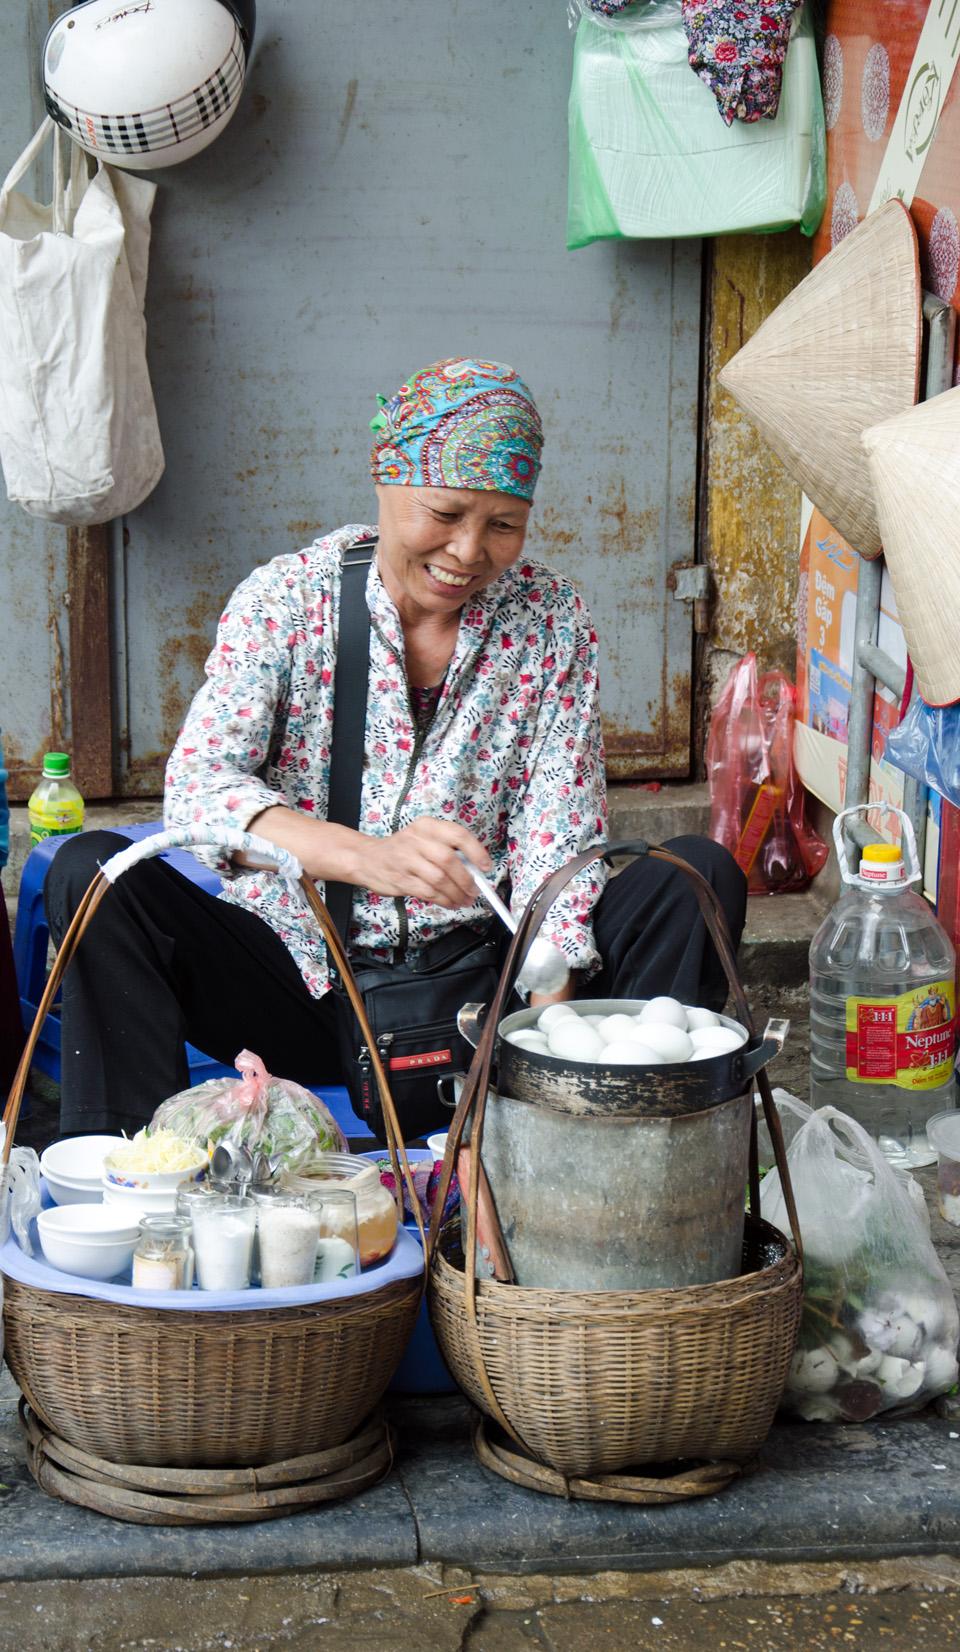 Balut vendor, Hanoi